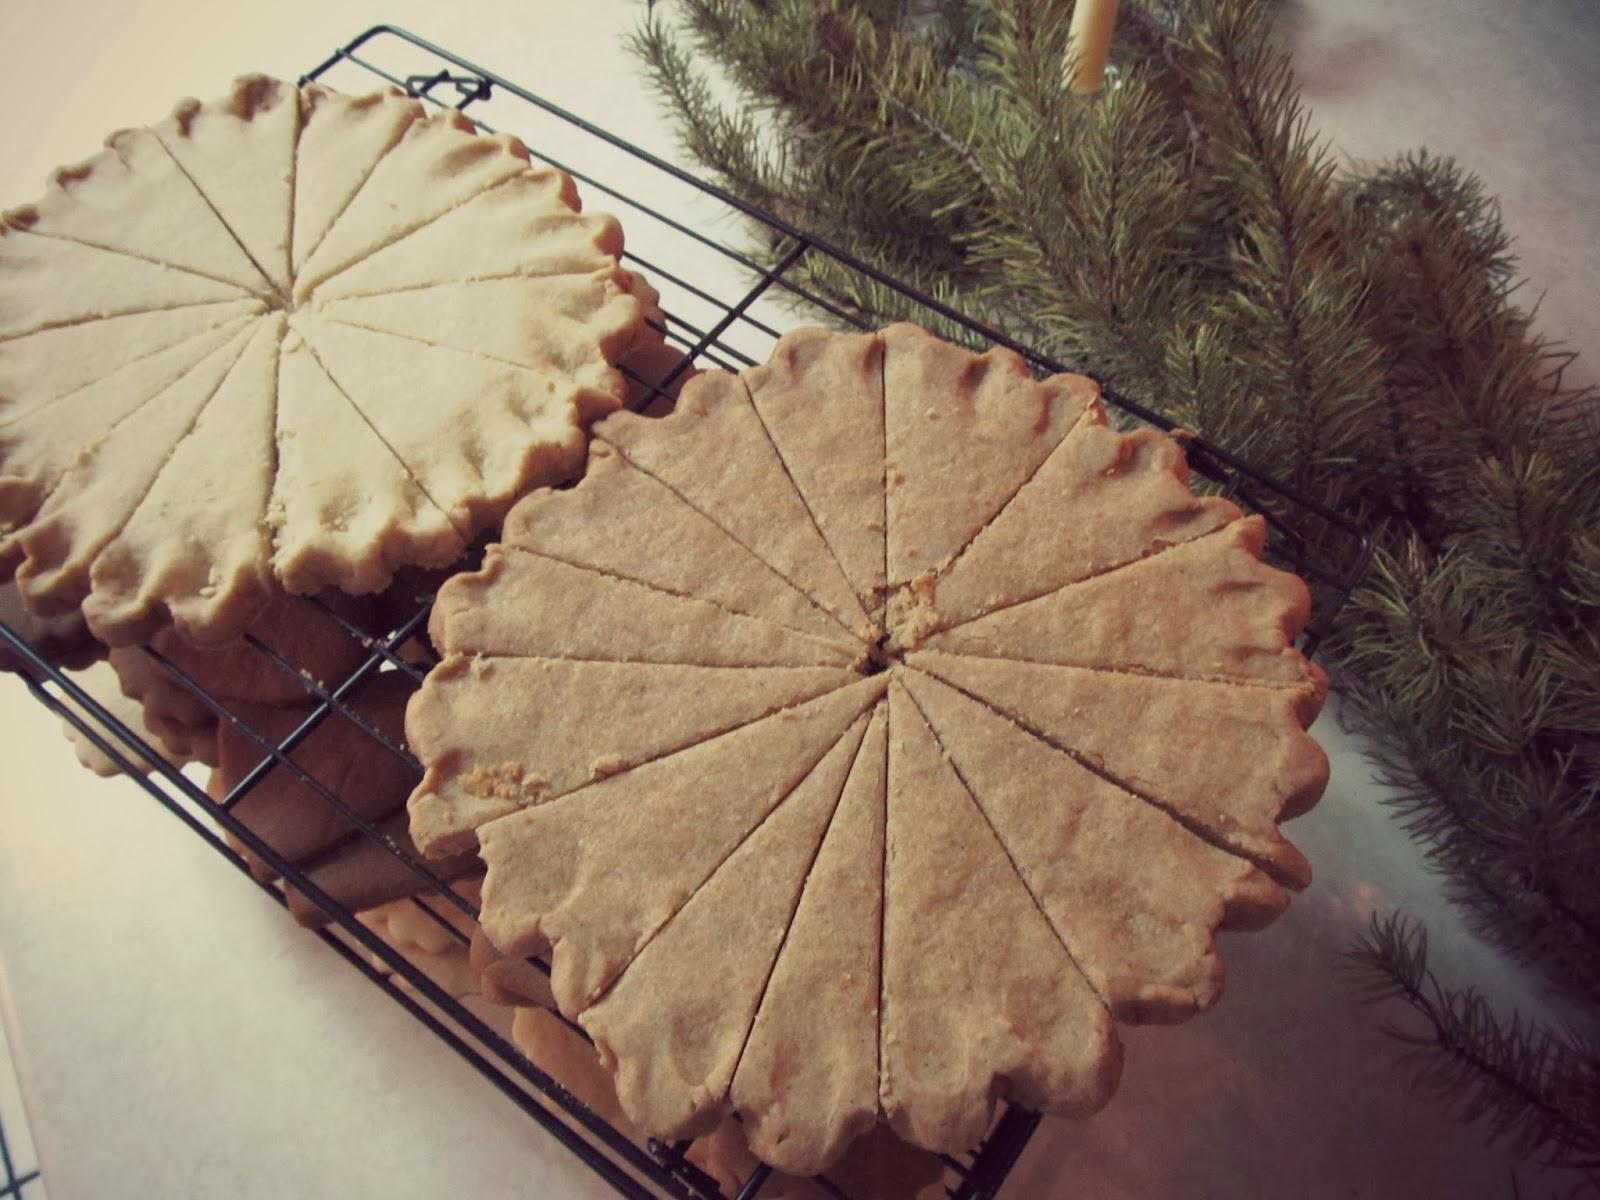 http://elcrumbo.blogspot.com/2013/12/i-got-little-carried-away-with-baking.html